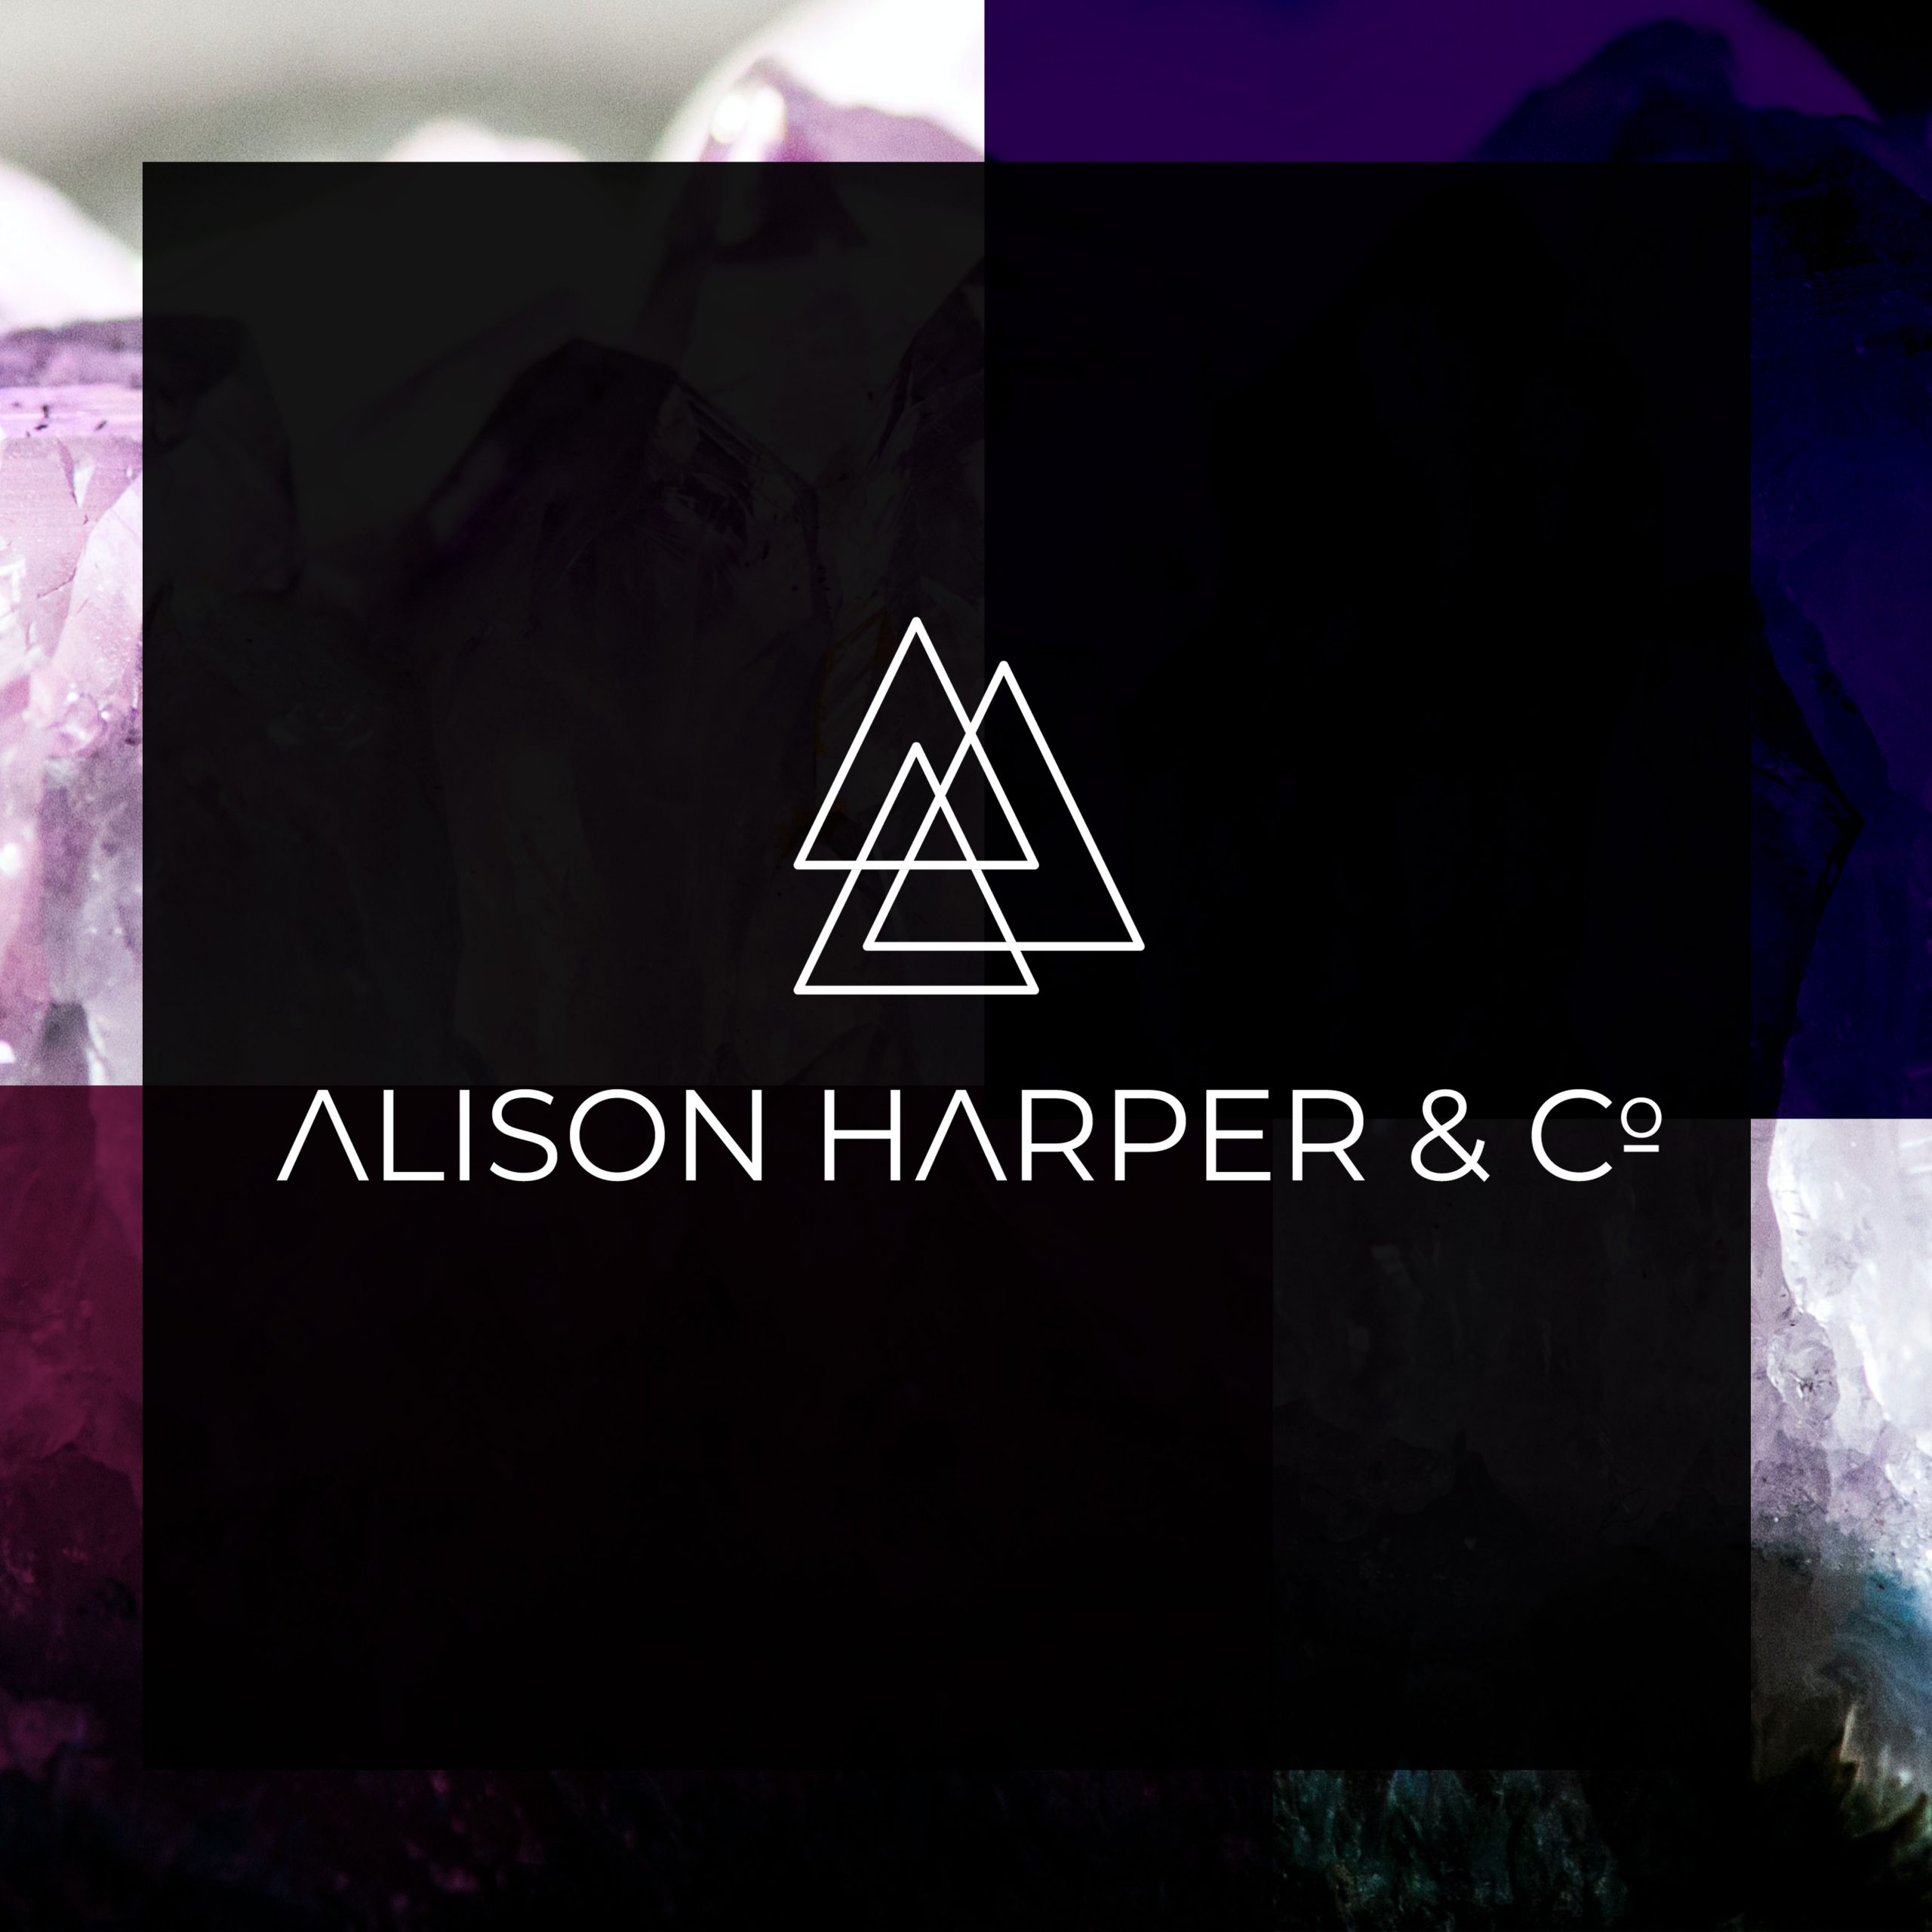 Design Opens Doors, rebrand Designed for Alison Harper & Company by C&V